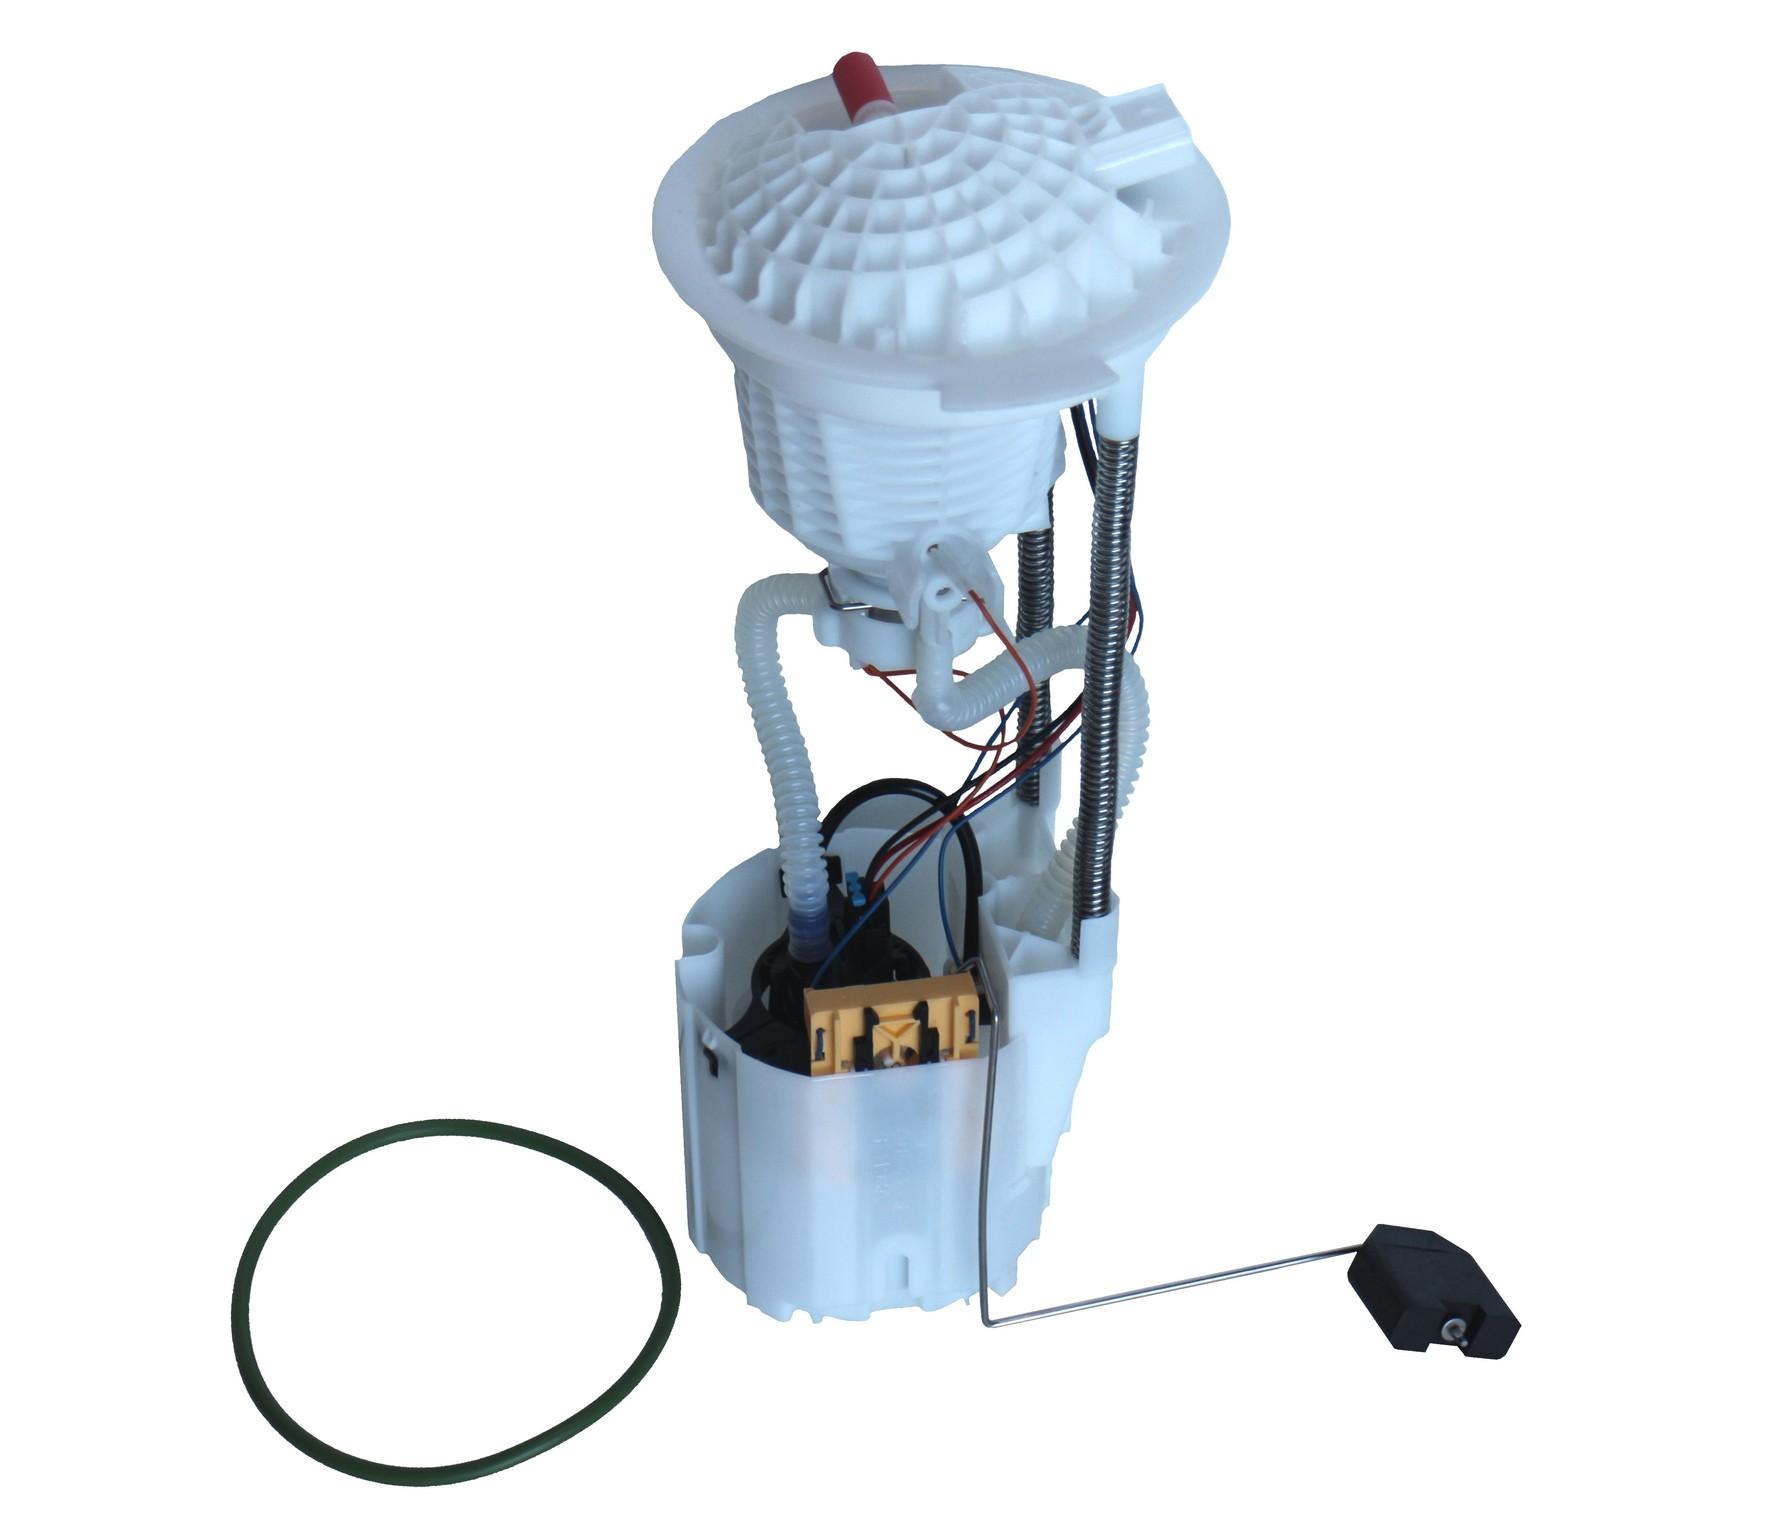 ... 2008 Dodge Ram 1500 Fuel Pump Module Assembly A0 F3193A ...